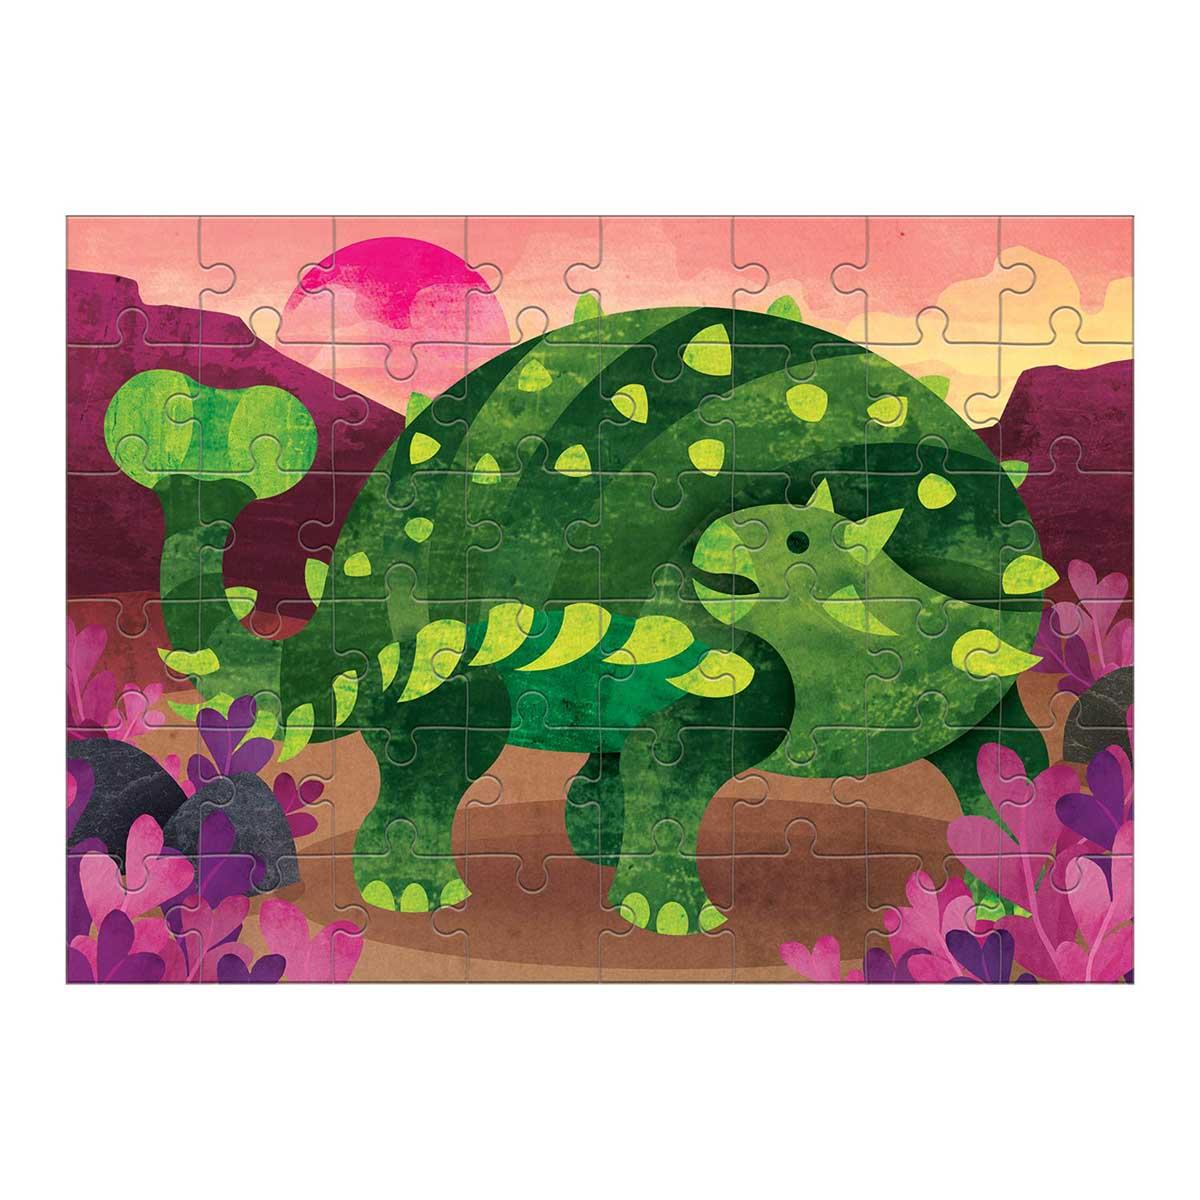 Ankylosaurus Dinosaurs Jigsaw Puzzle